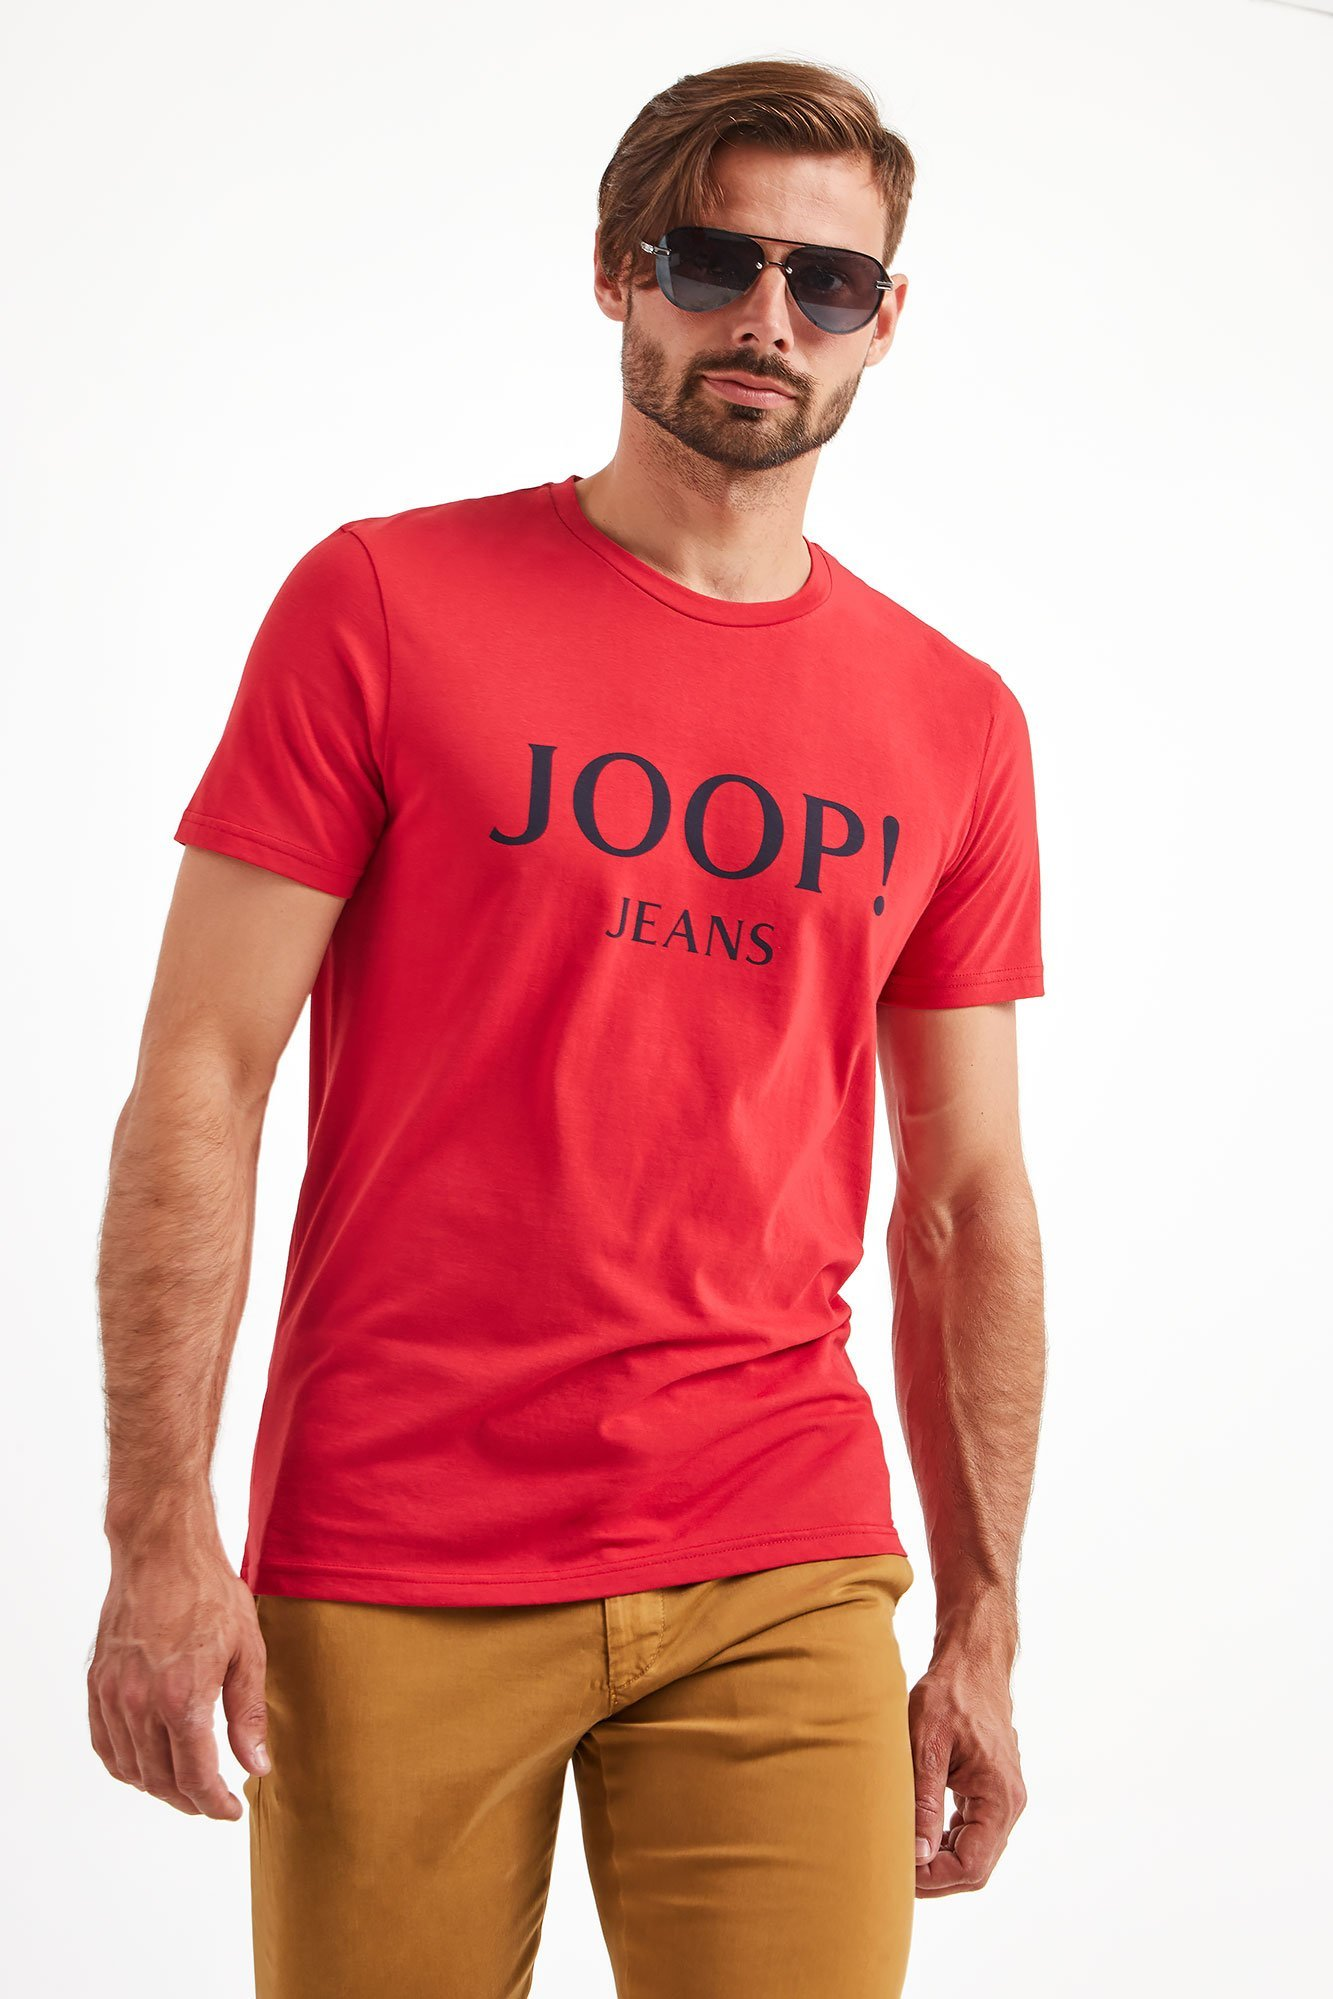 T-SHIRT ALEX JOOP! JEANS rozmiar XL